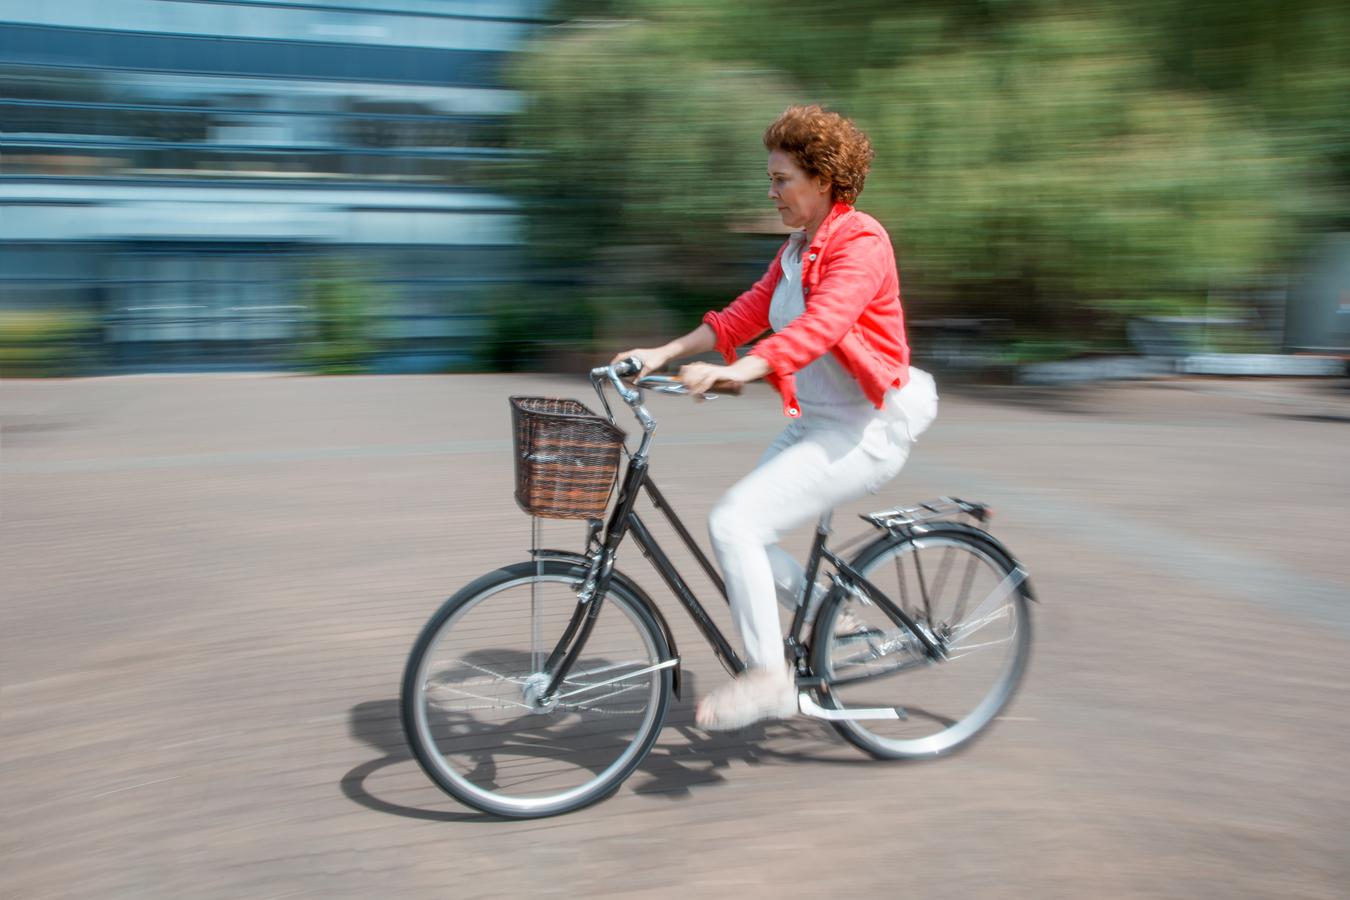 Dáma na kole